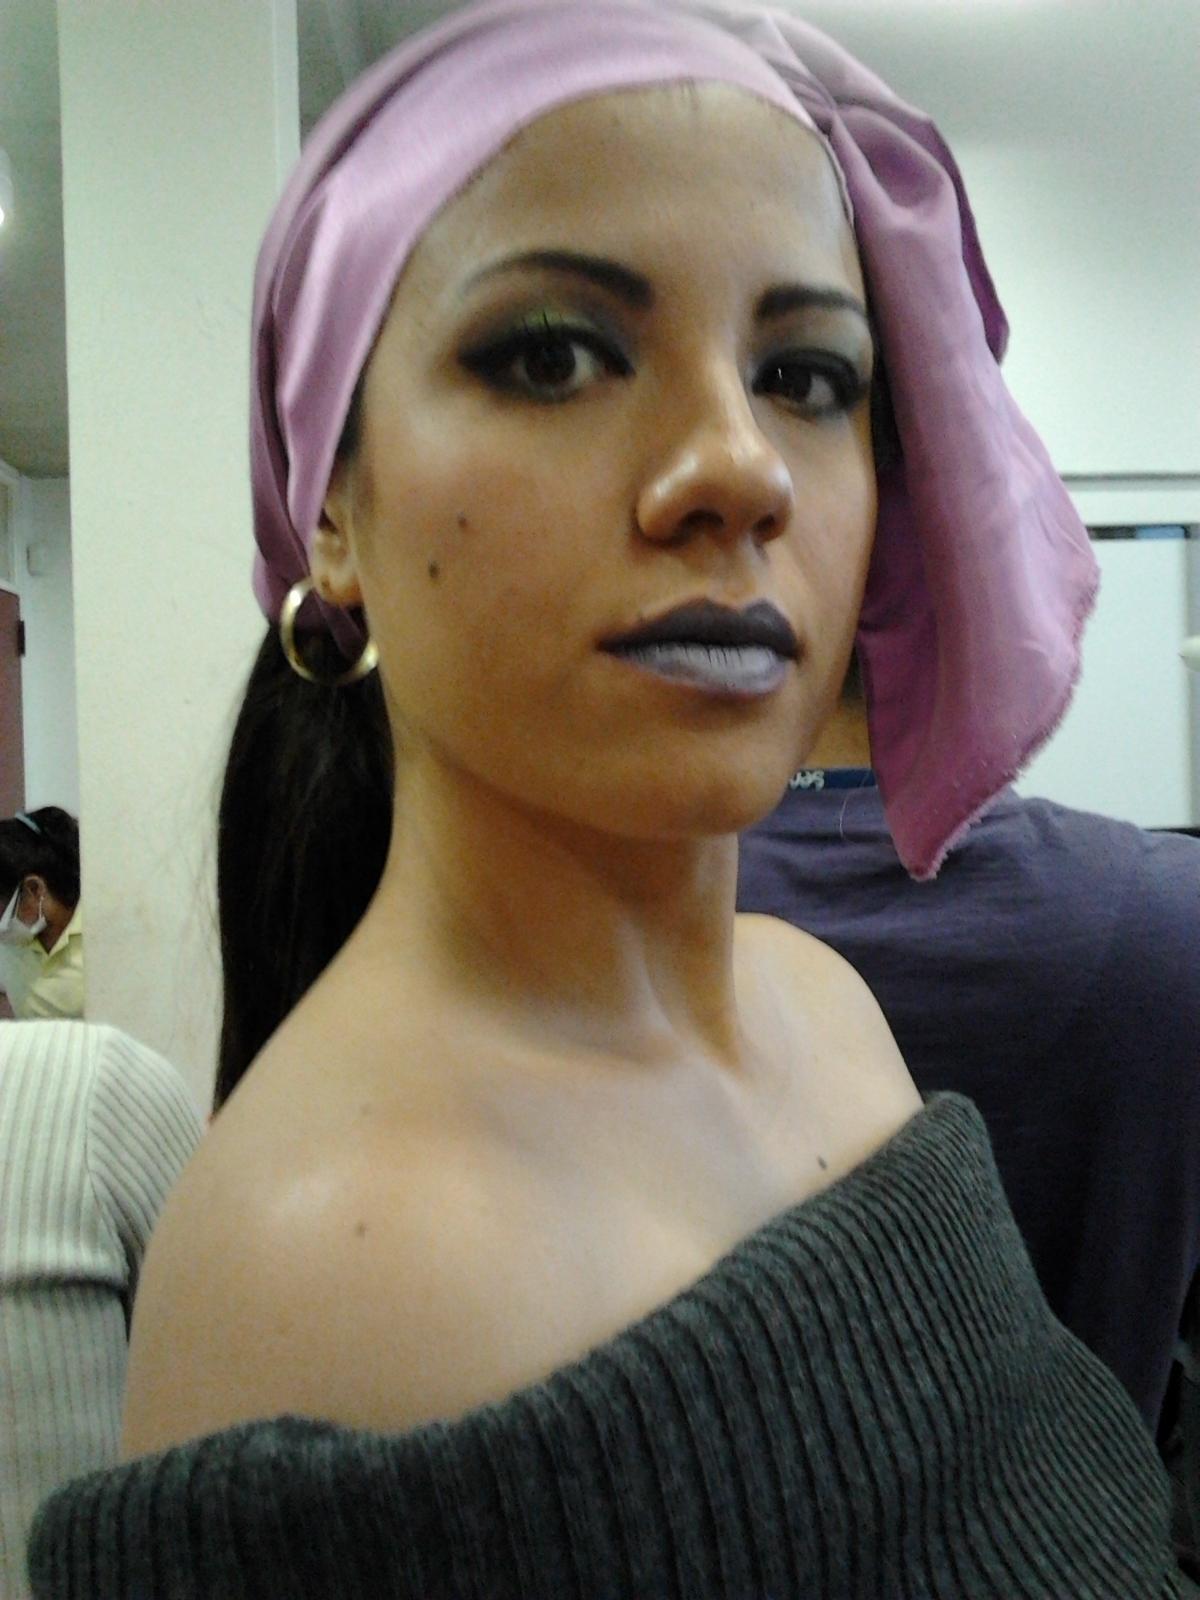 Maquiagem03 maquiador(a) consultor(a) de estetica